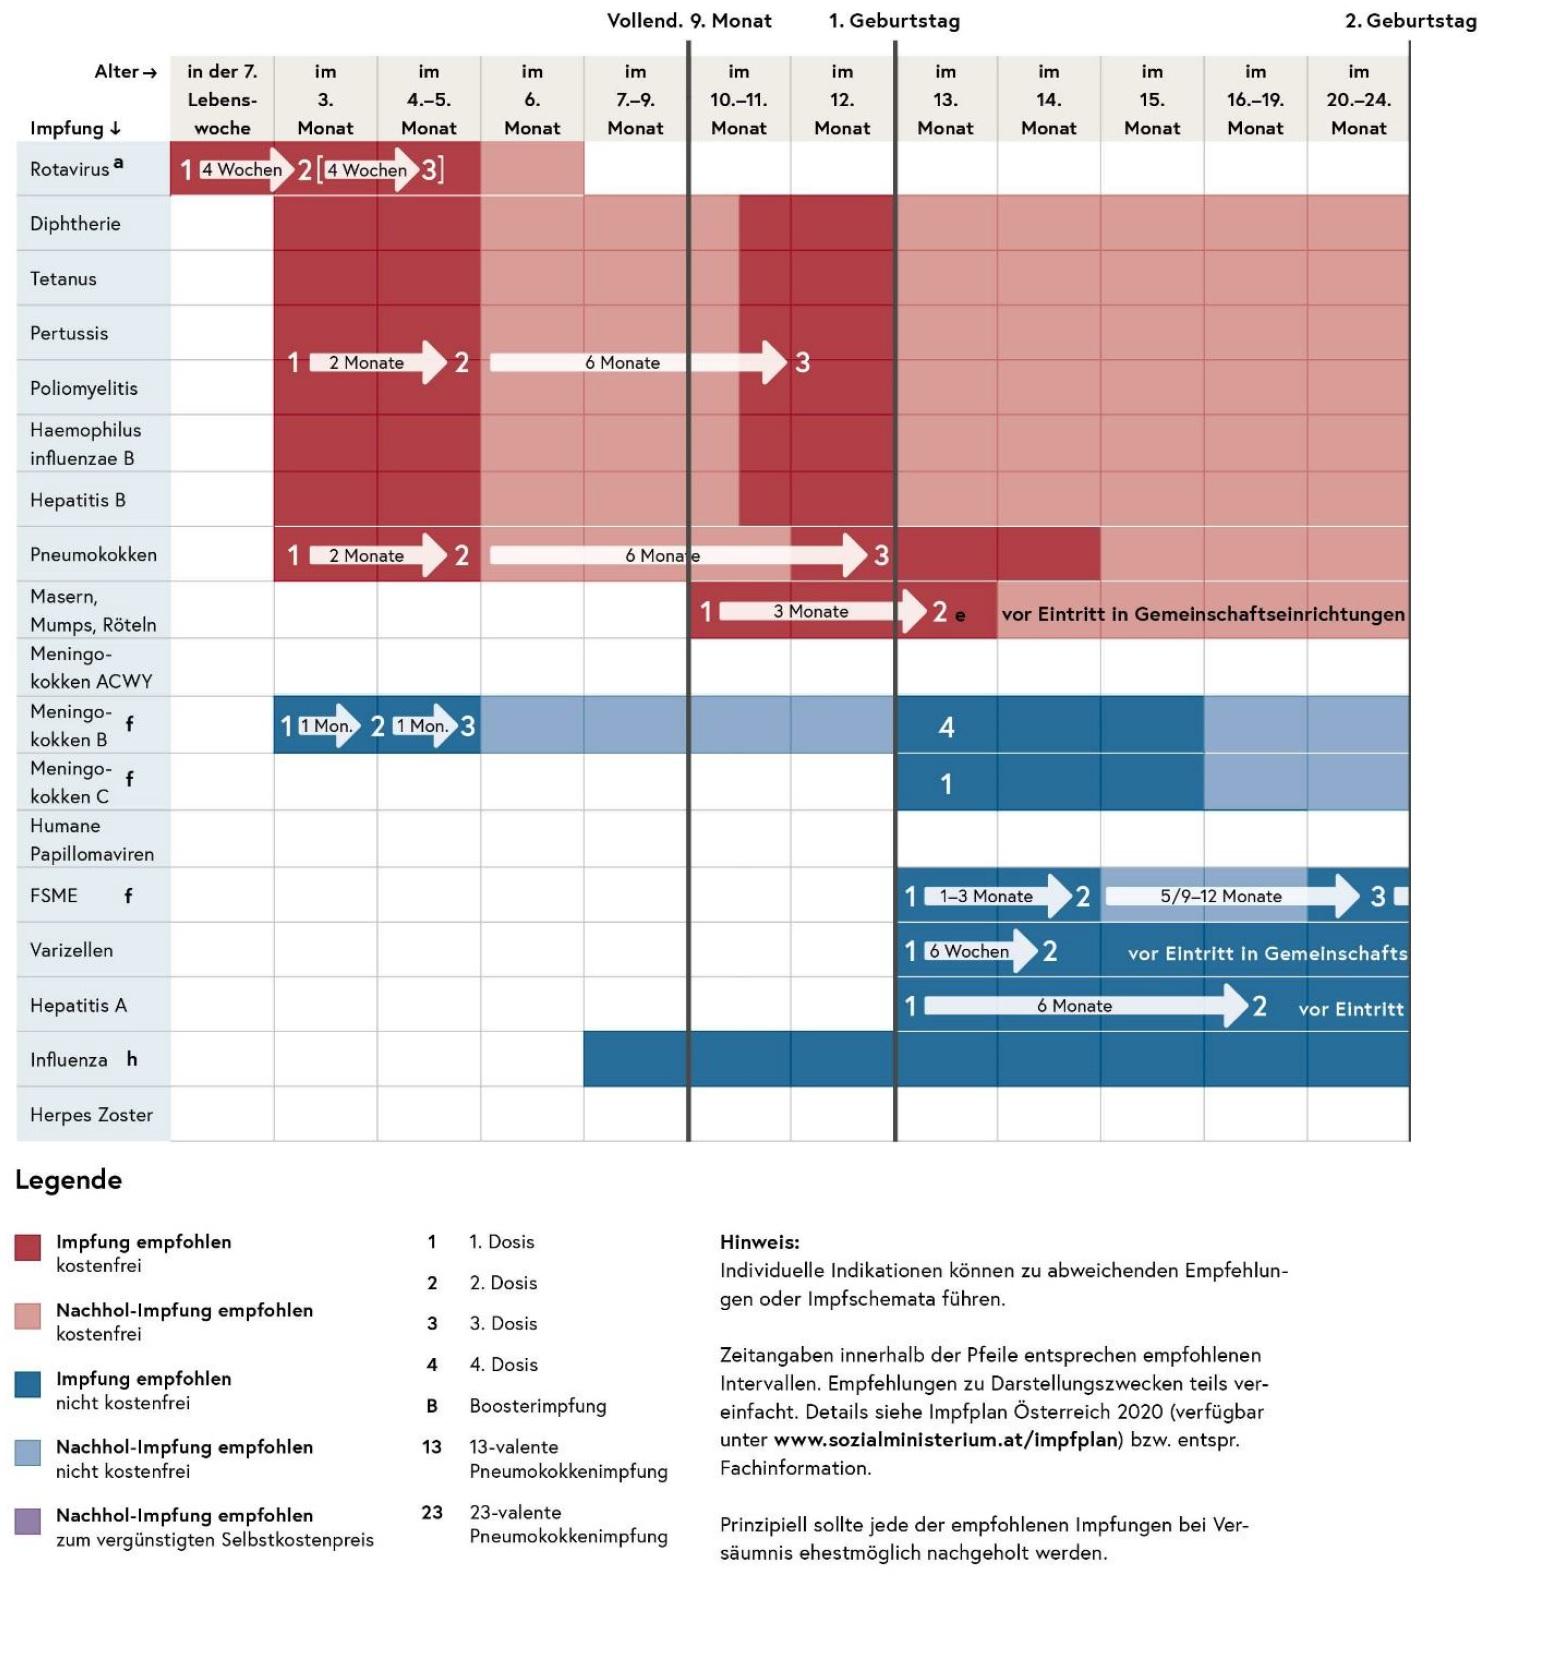 Impfplan 2020 5